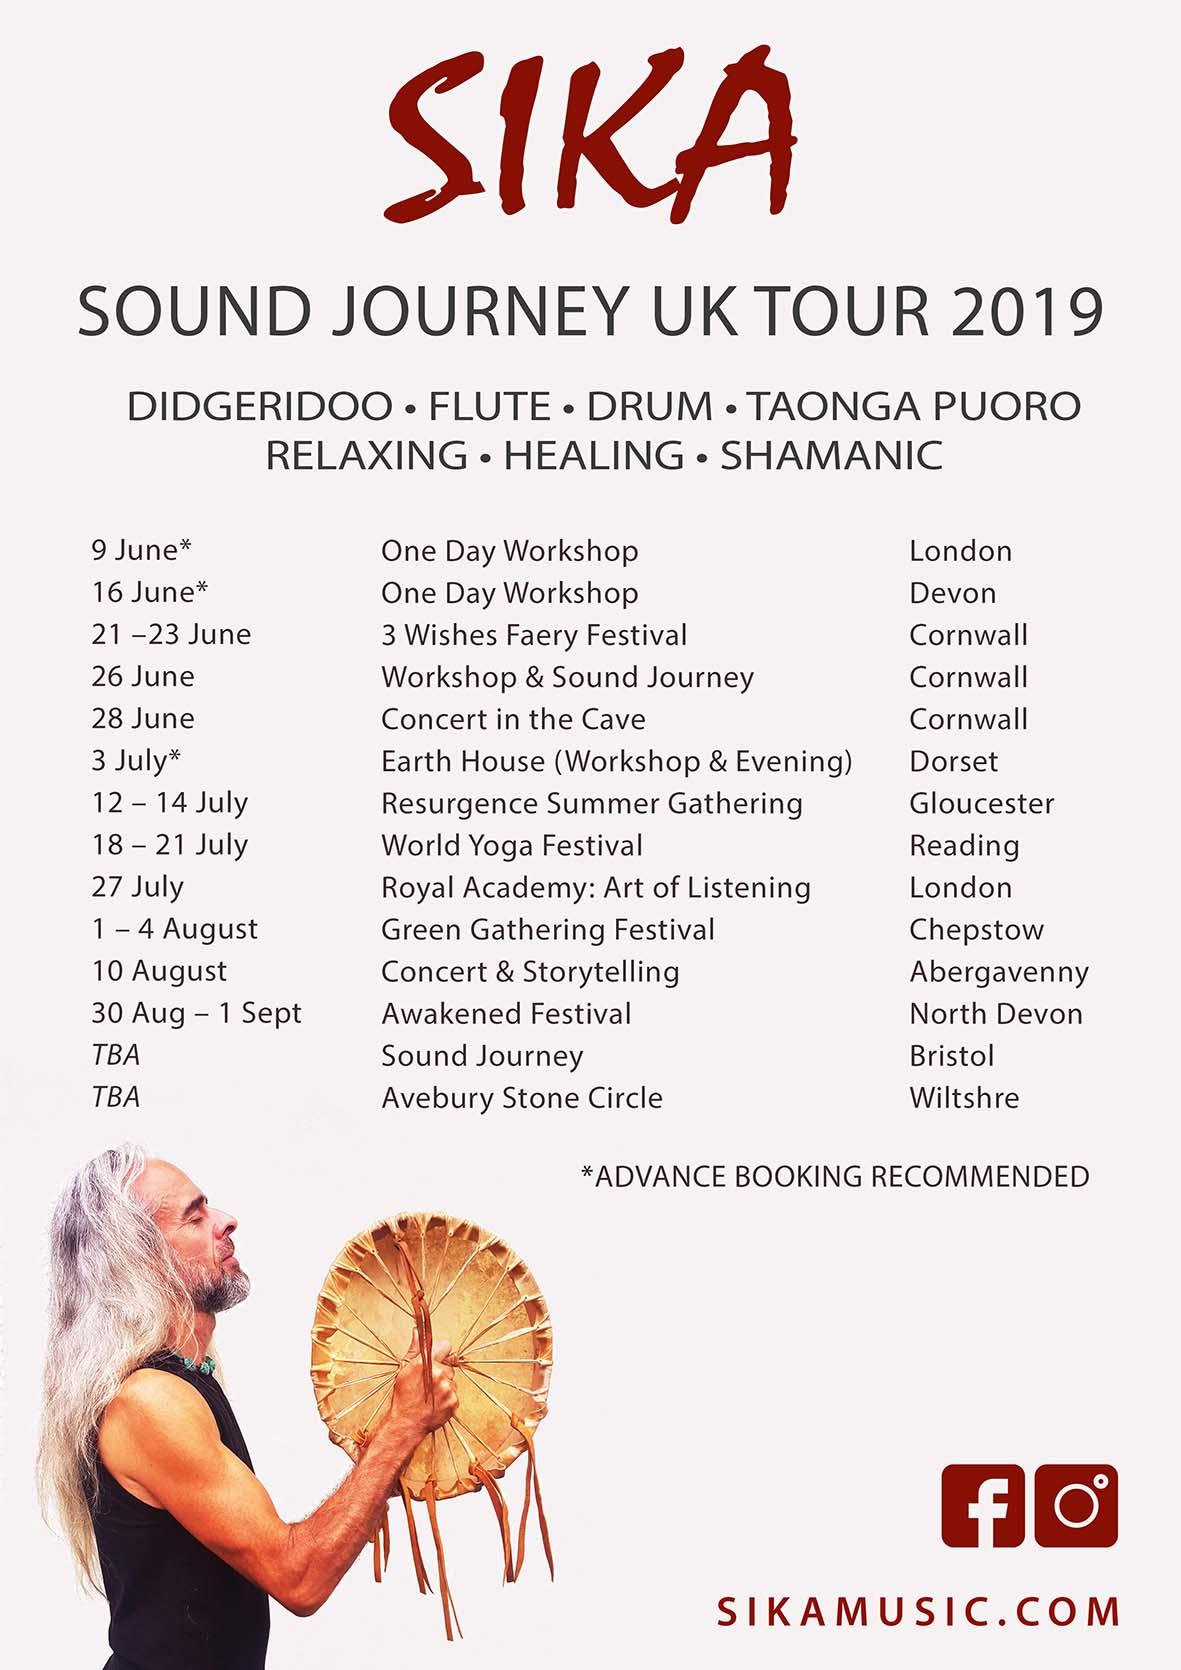 UK Sound Journey Dates